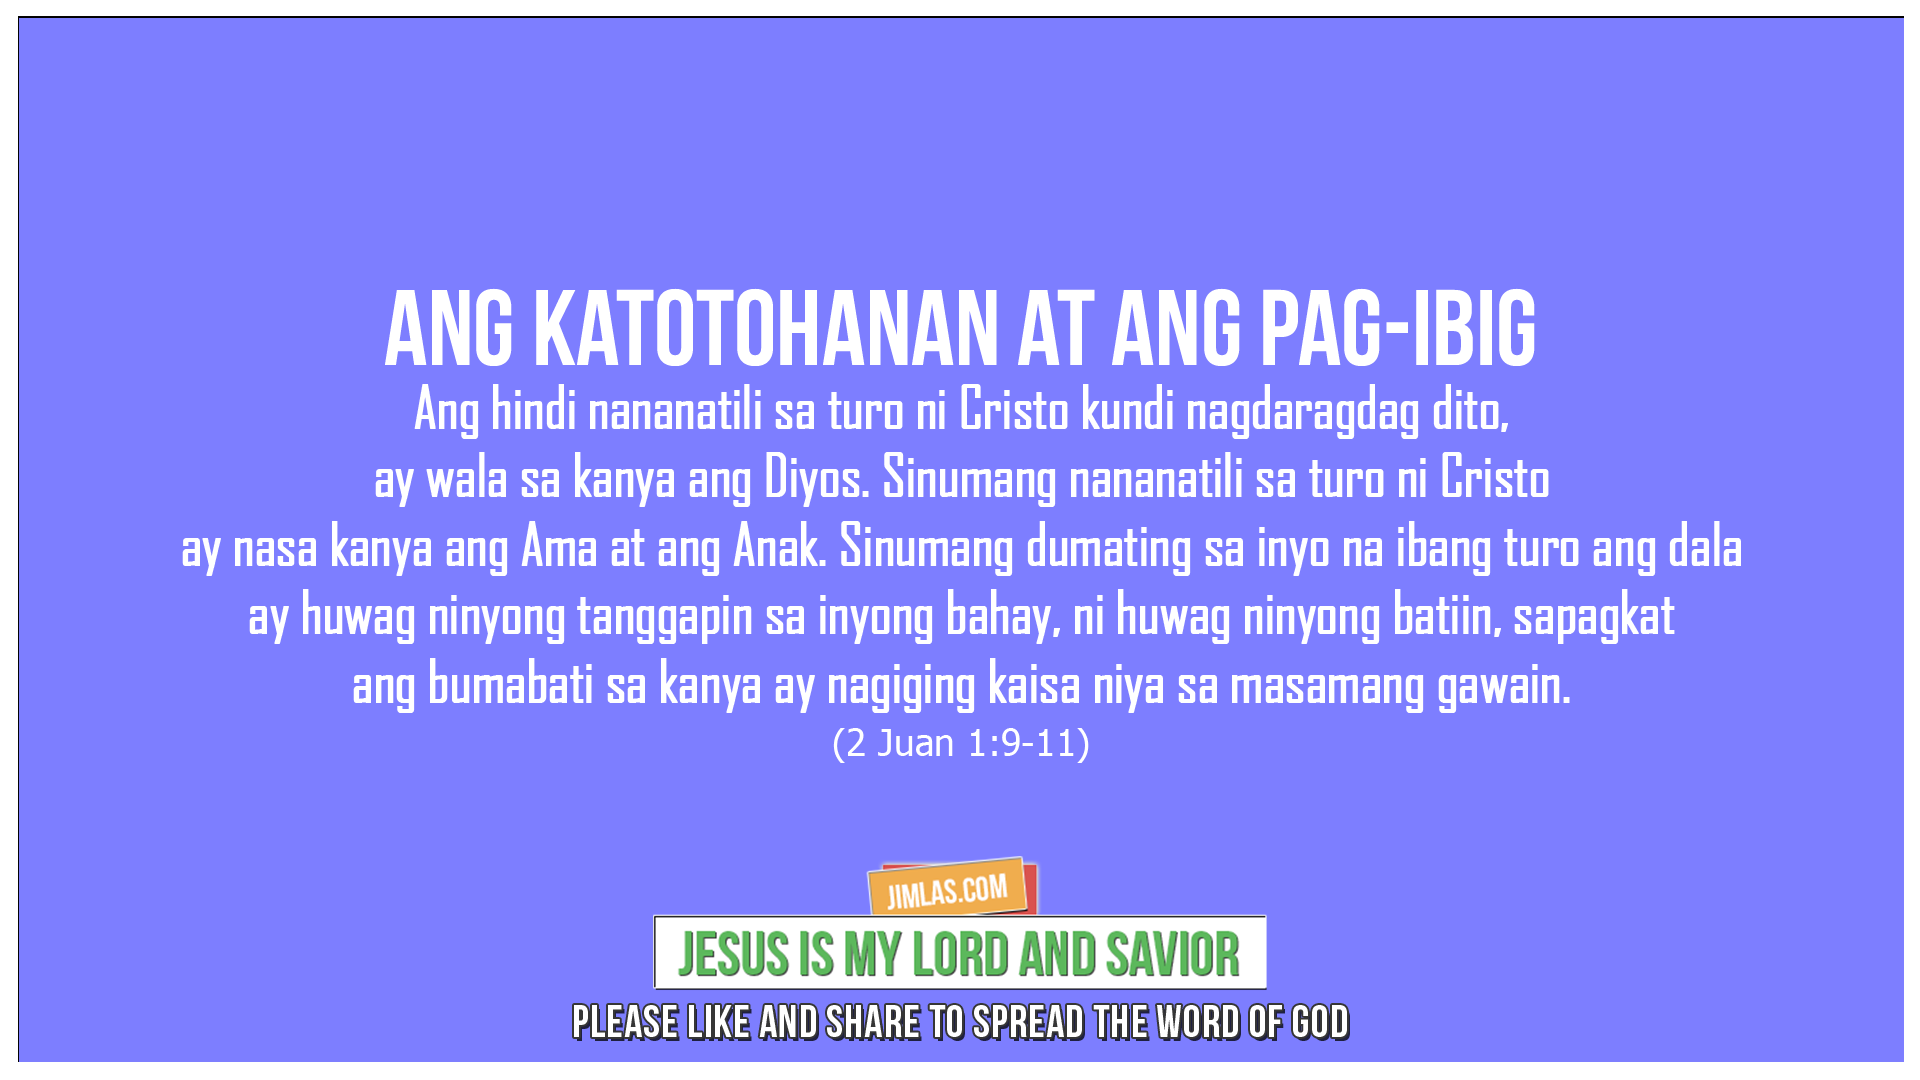 2 Juan 1:9-11, 2 Juan 1:9-11